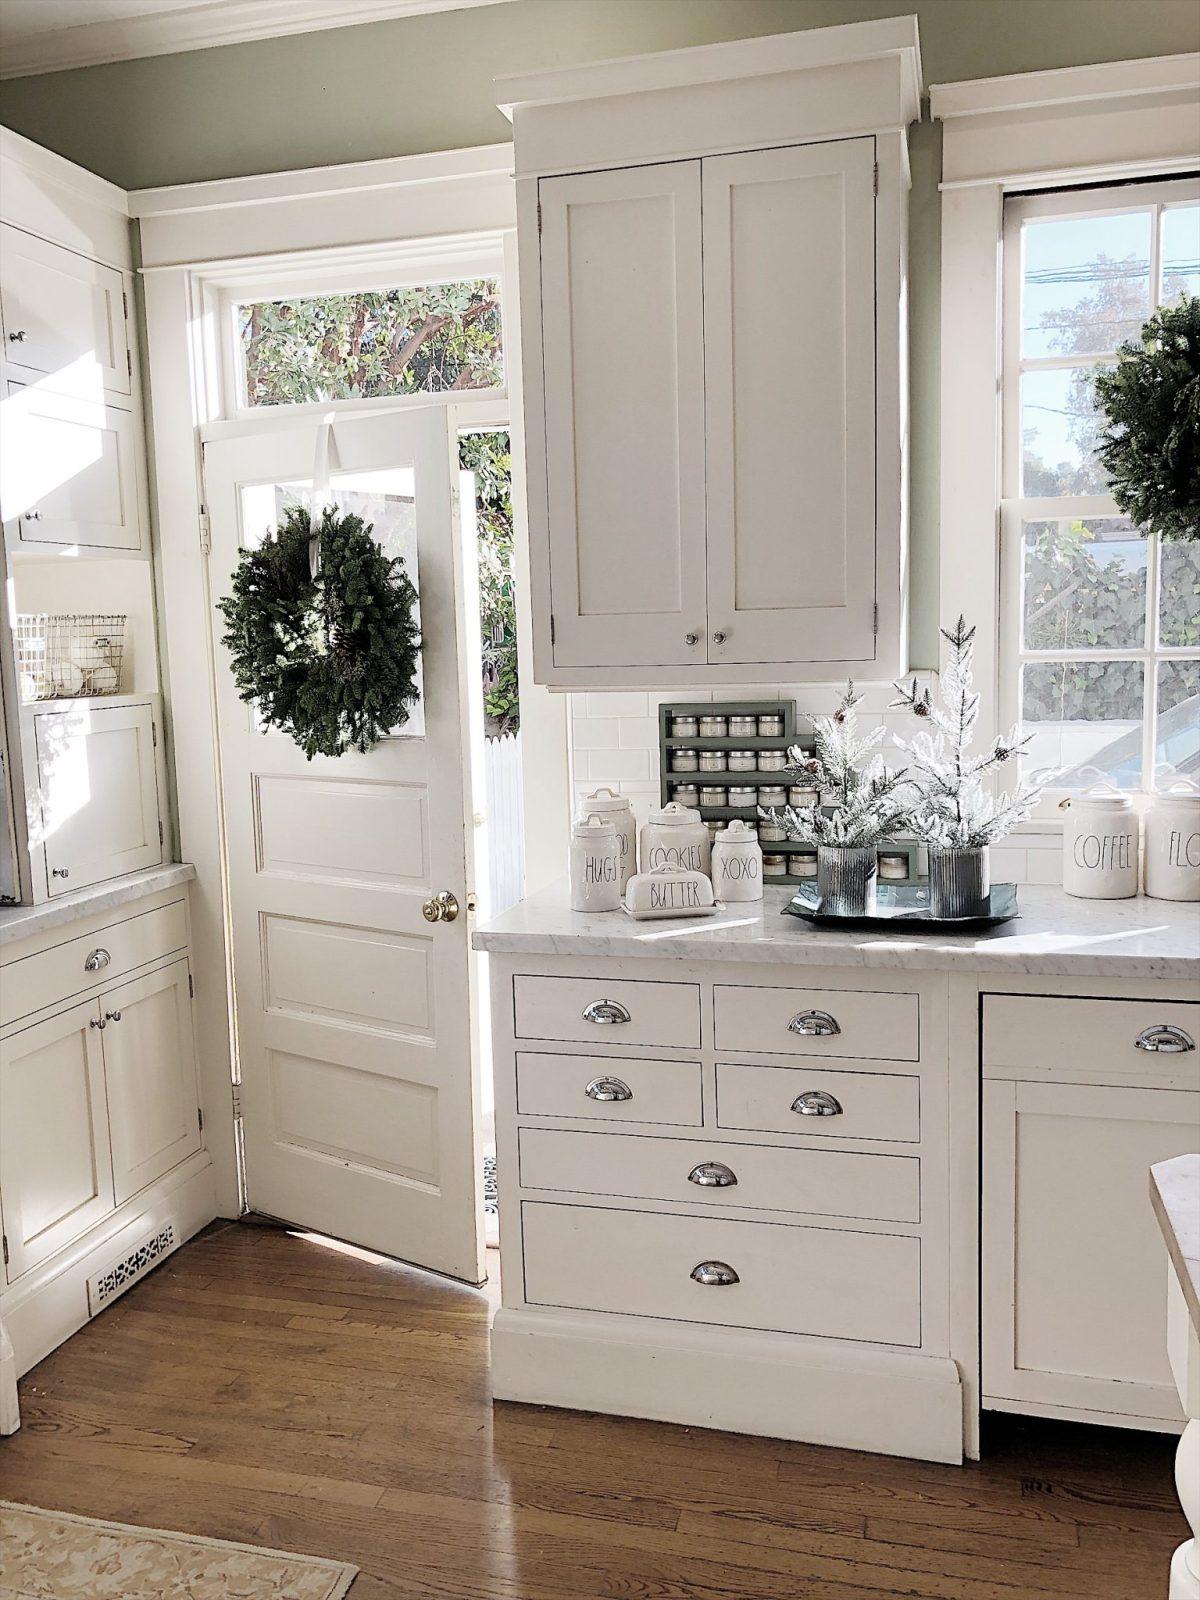 Kitchen decor Christmas